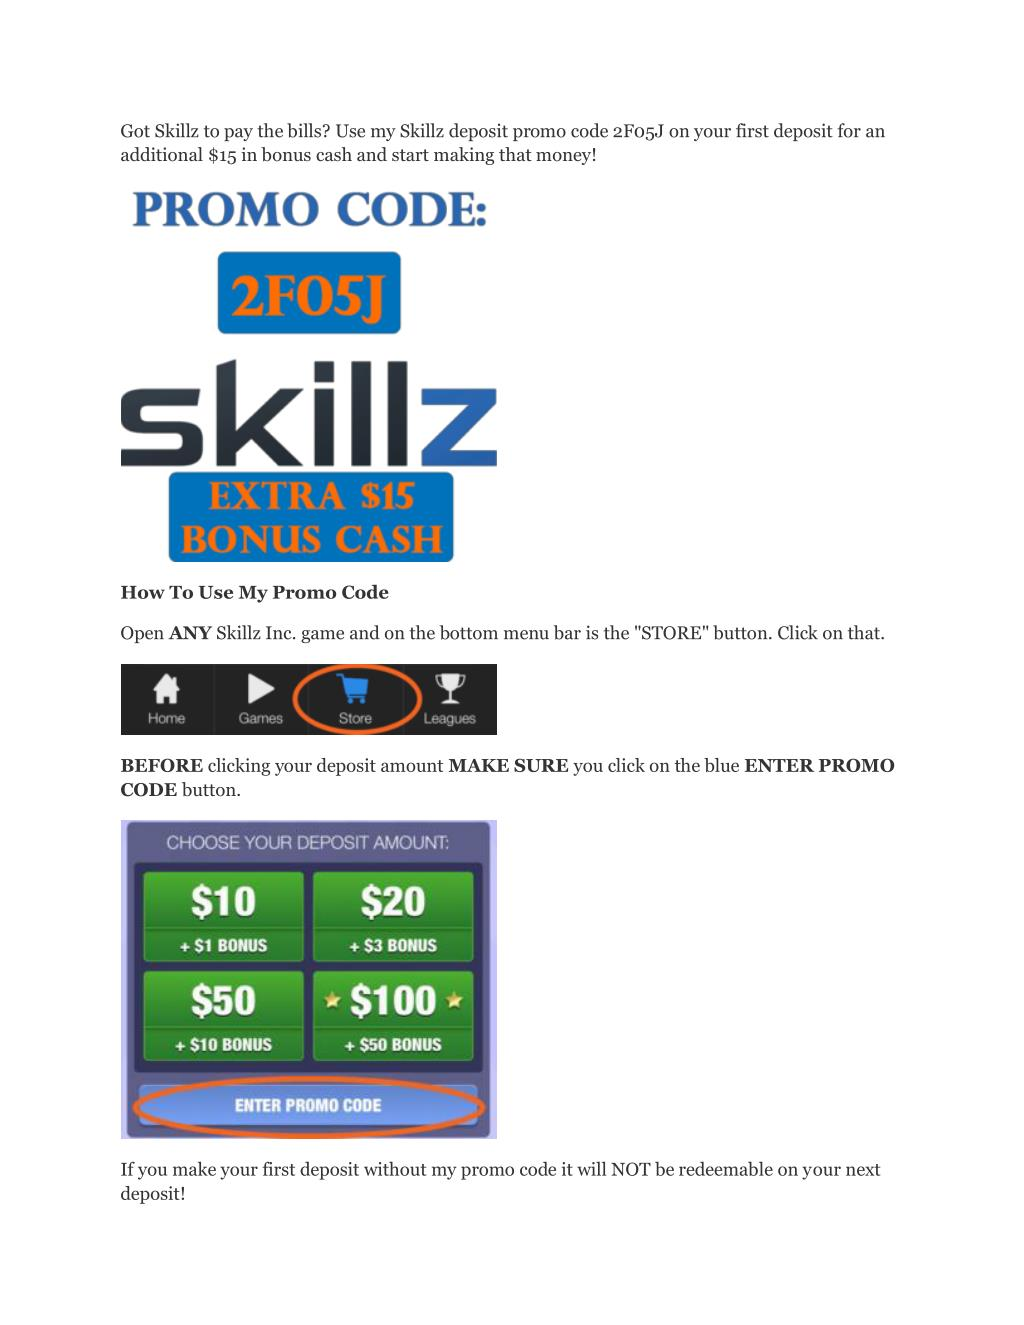 PPT - Skillz_Promo_Codez PowerPoint Presentation - ID:7368348